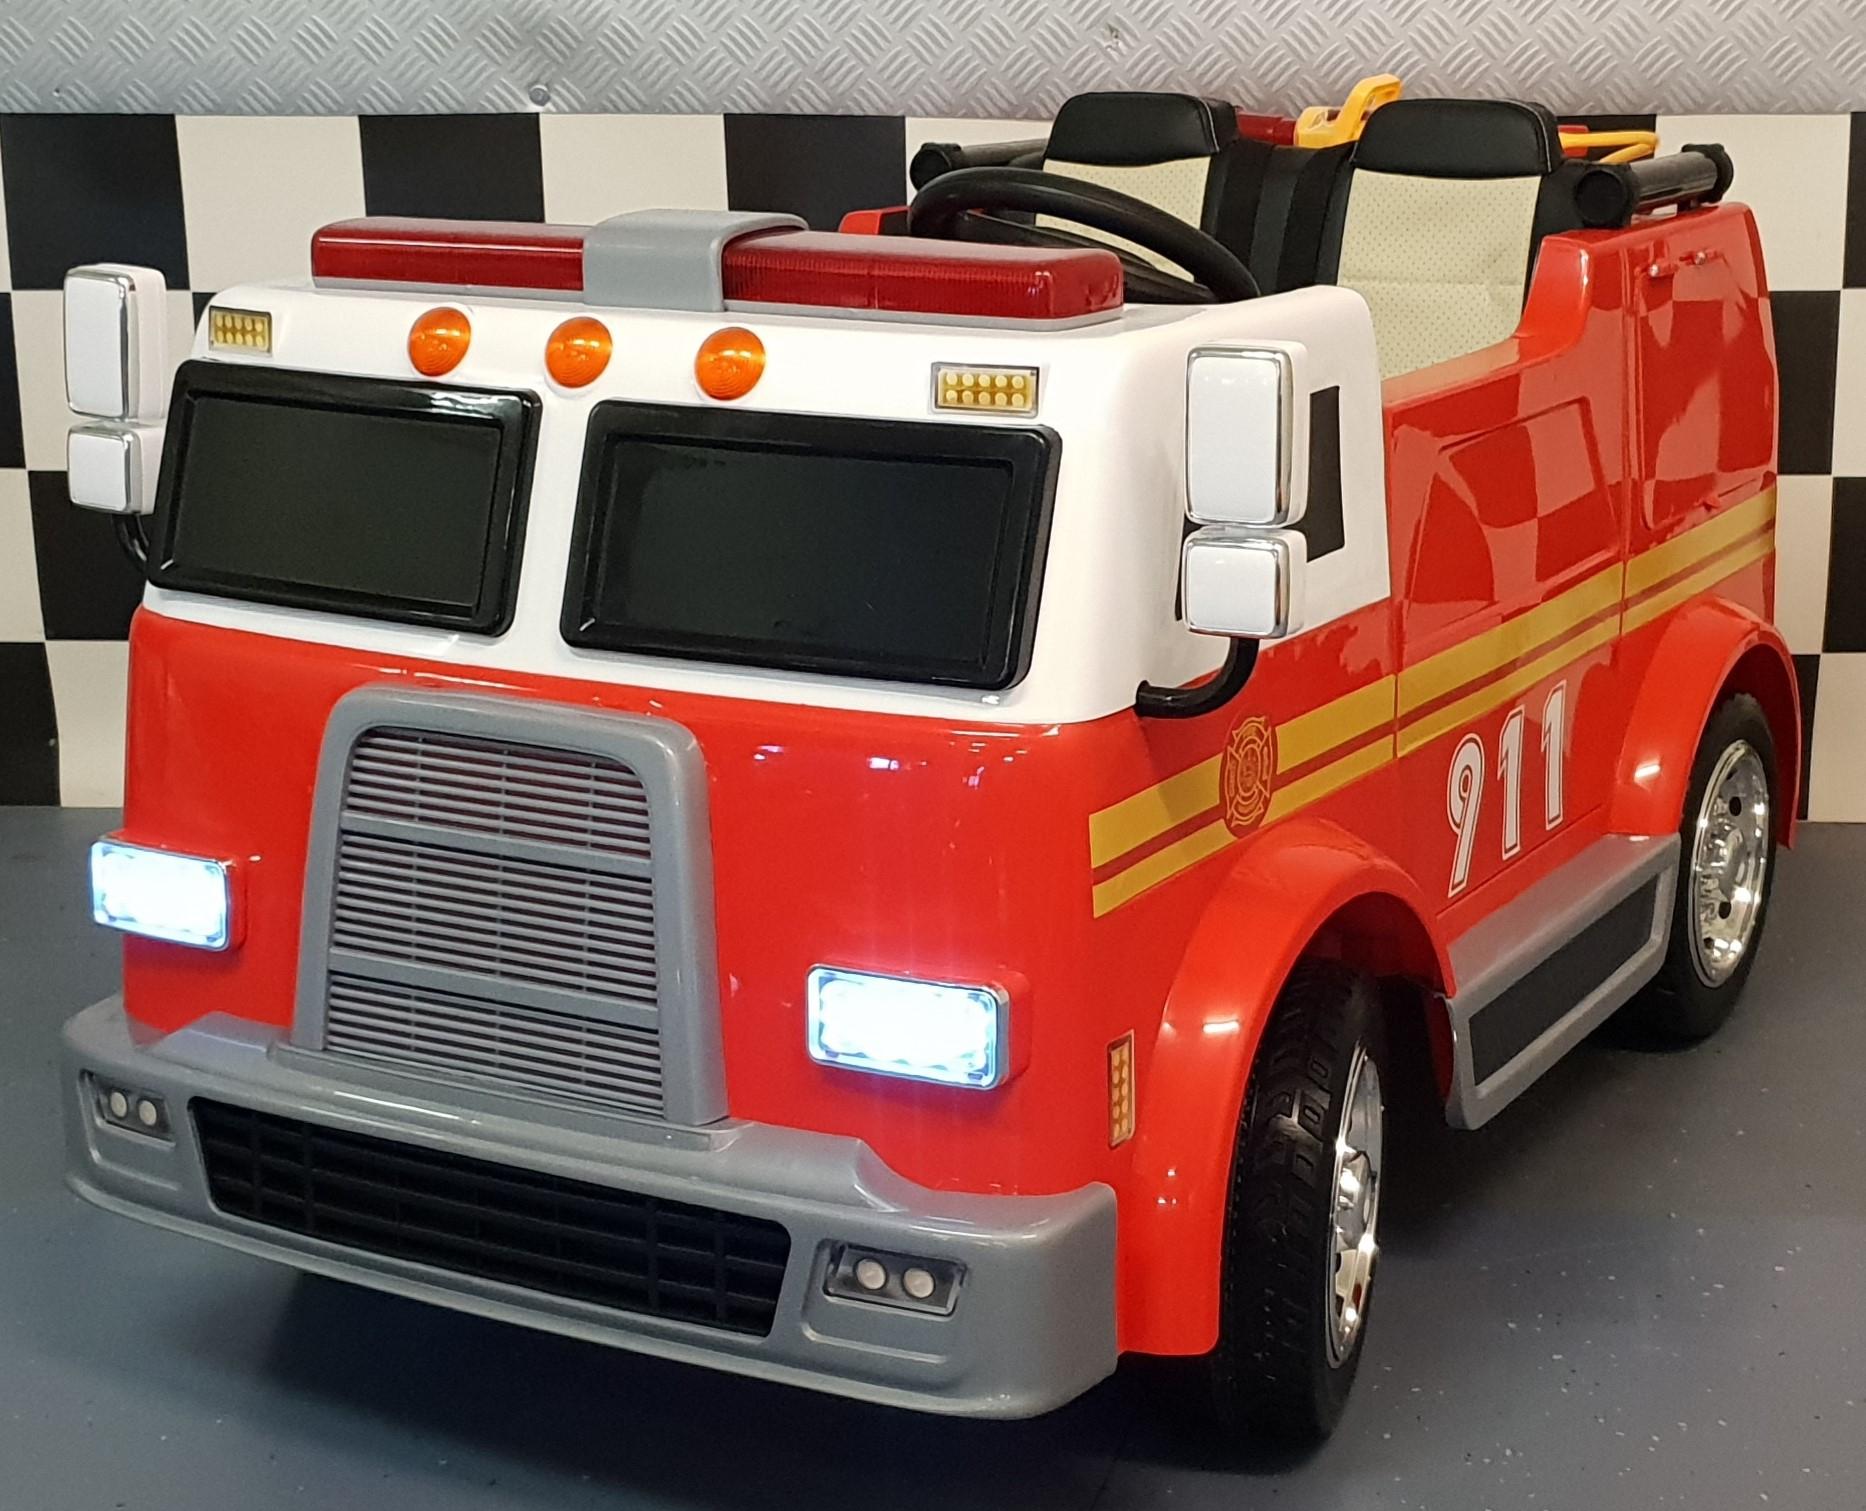 2 persoons  elektrische brandweer kinderauto 12V 2.4G RC